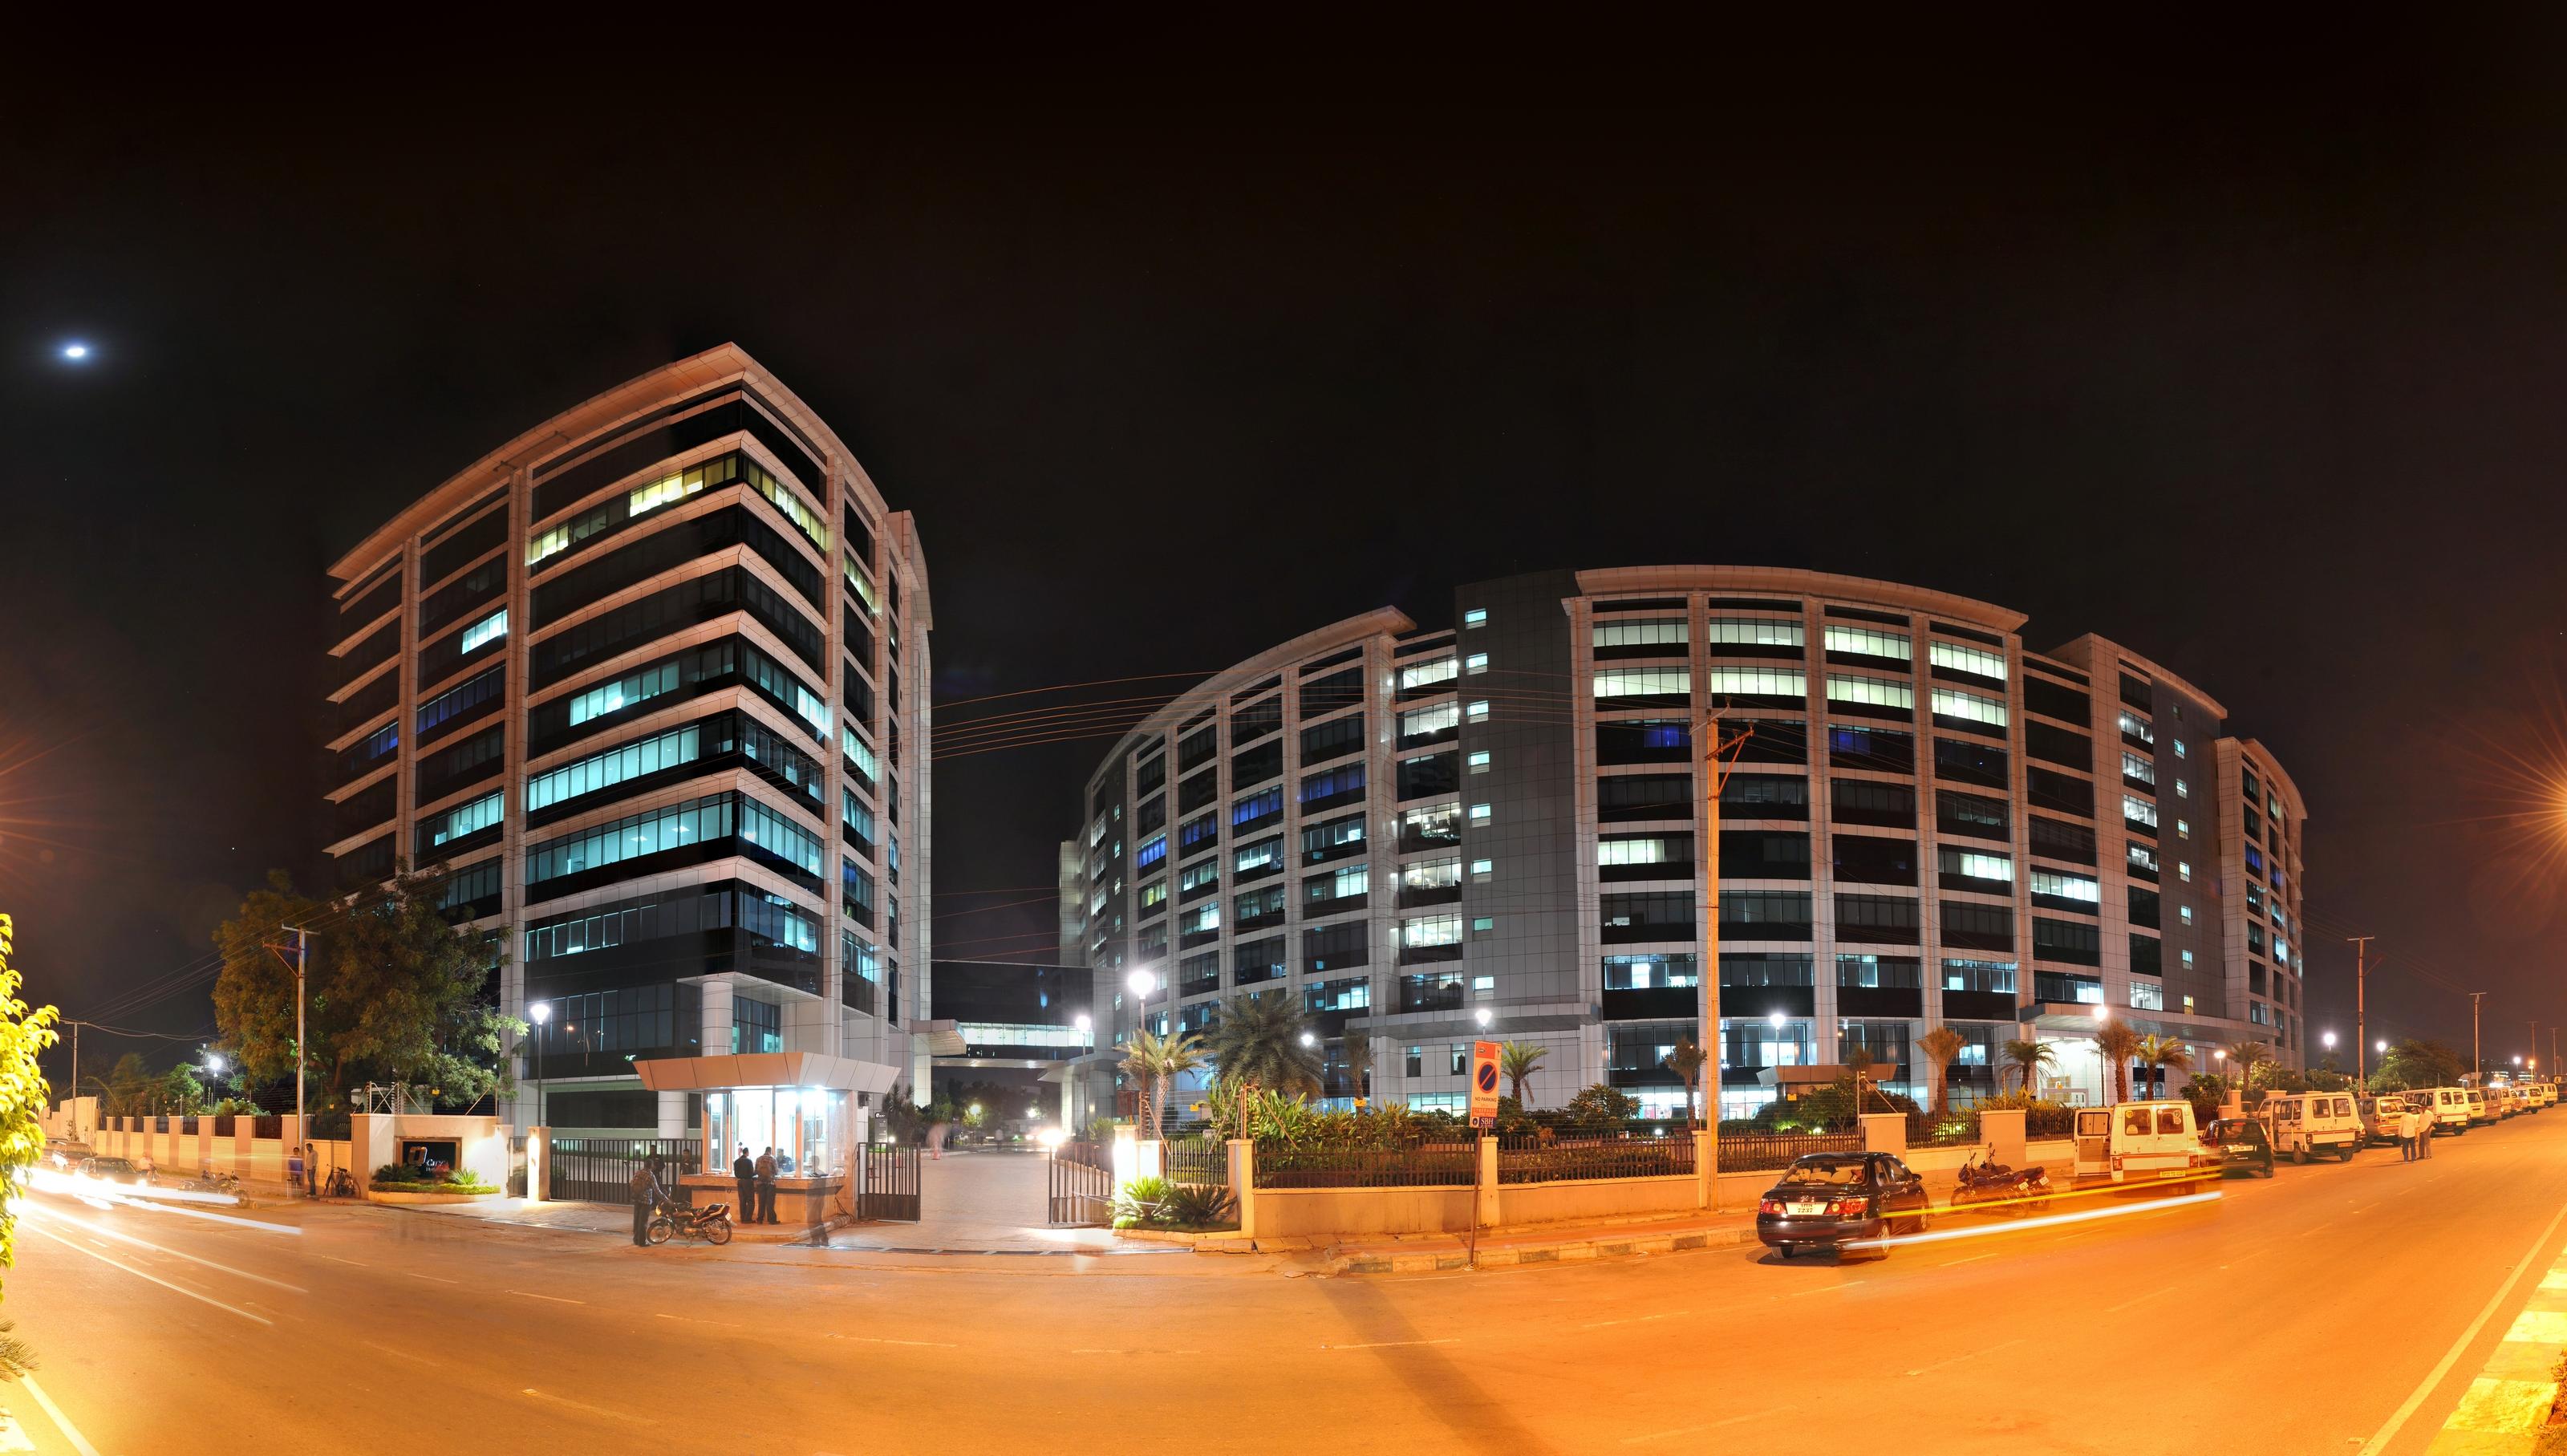 MDS_3293 Panorama